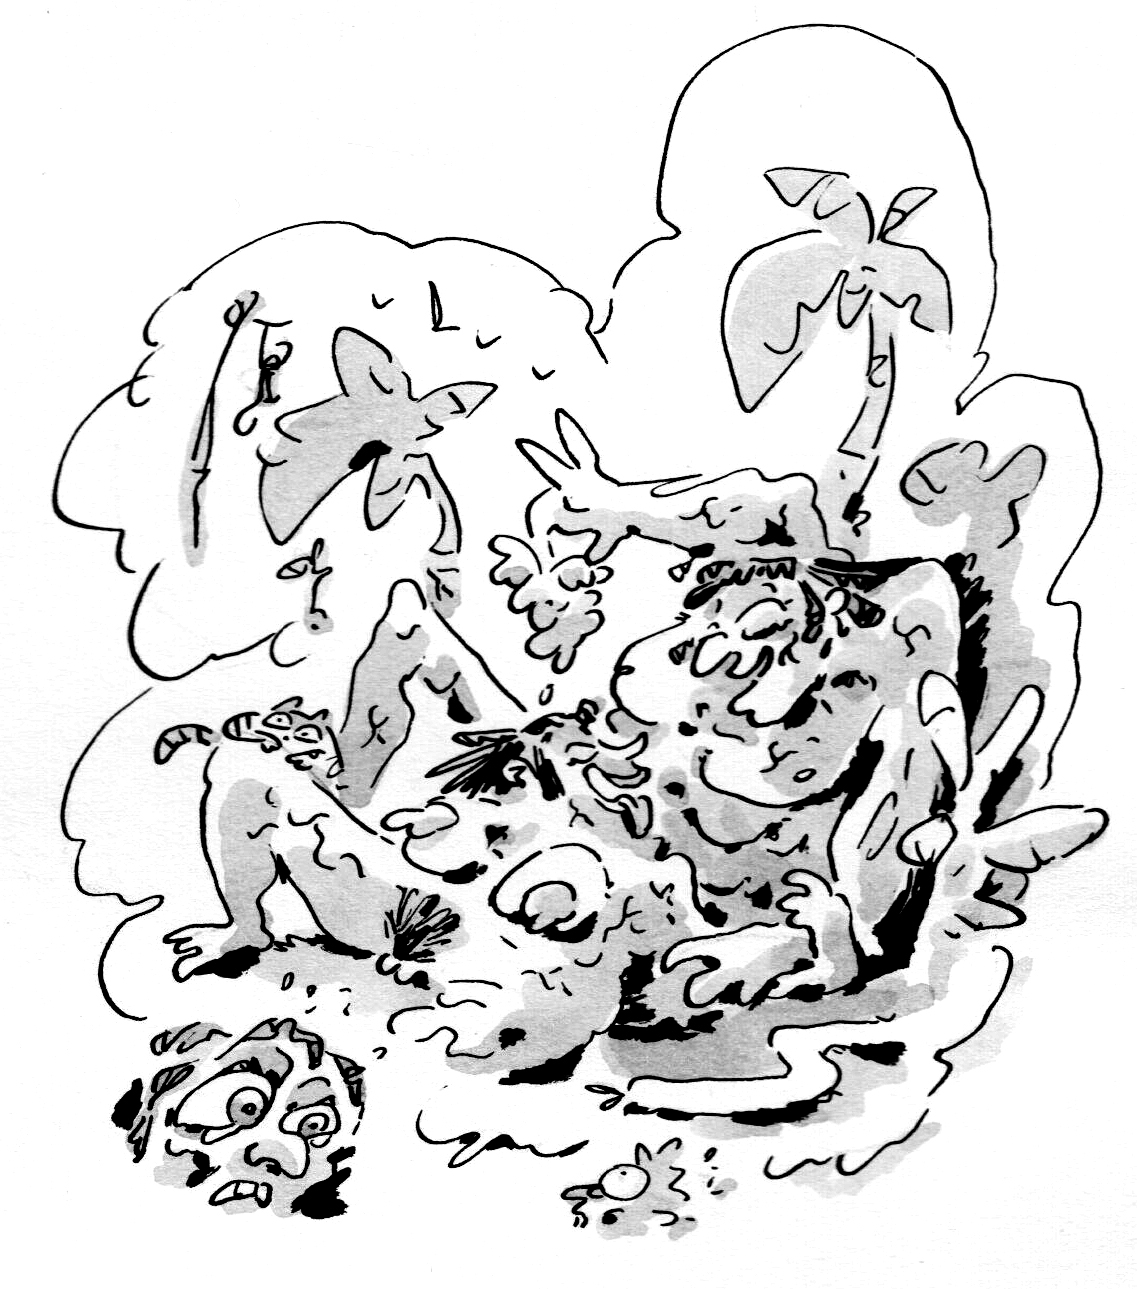 izar-lunacek-cacke-tuhtci-12-image20